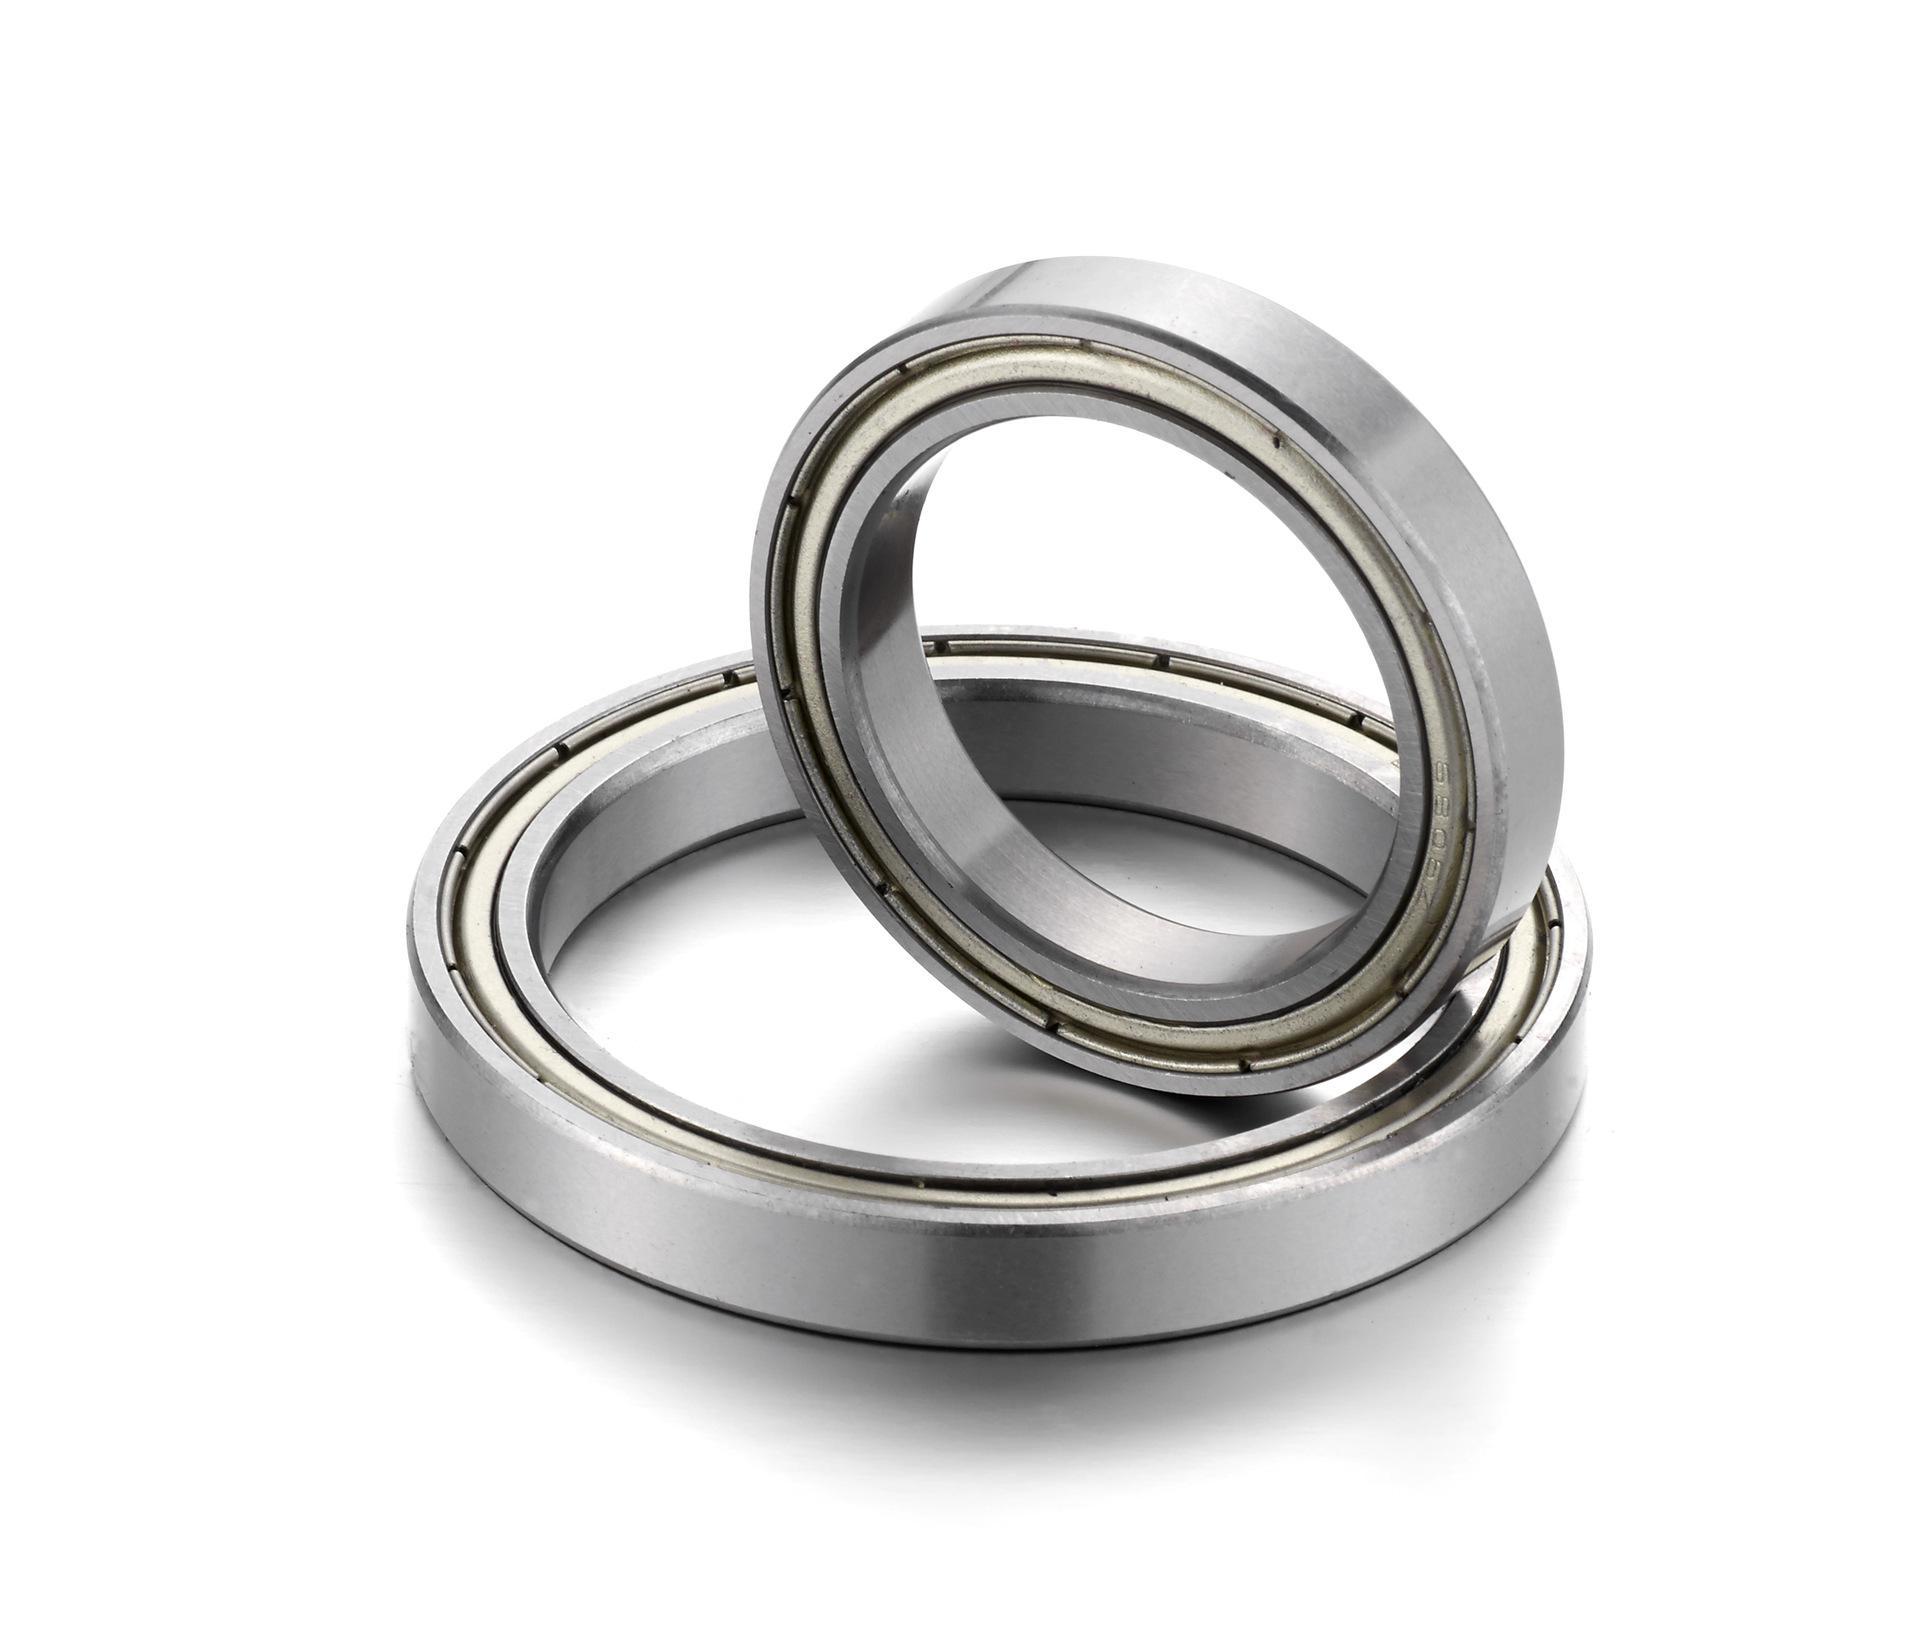 6828 ZZ 140x175x18mm Metric Thin Section Bearings 61828 ZZ 6828ZZ gcr15 61828 2rs or 61828 zz 140x175x18mm high precision thin deep groove ball bearings abec 1 p0